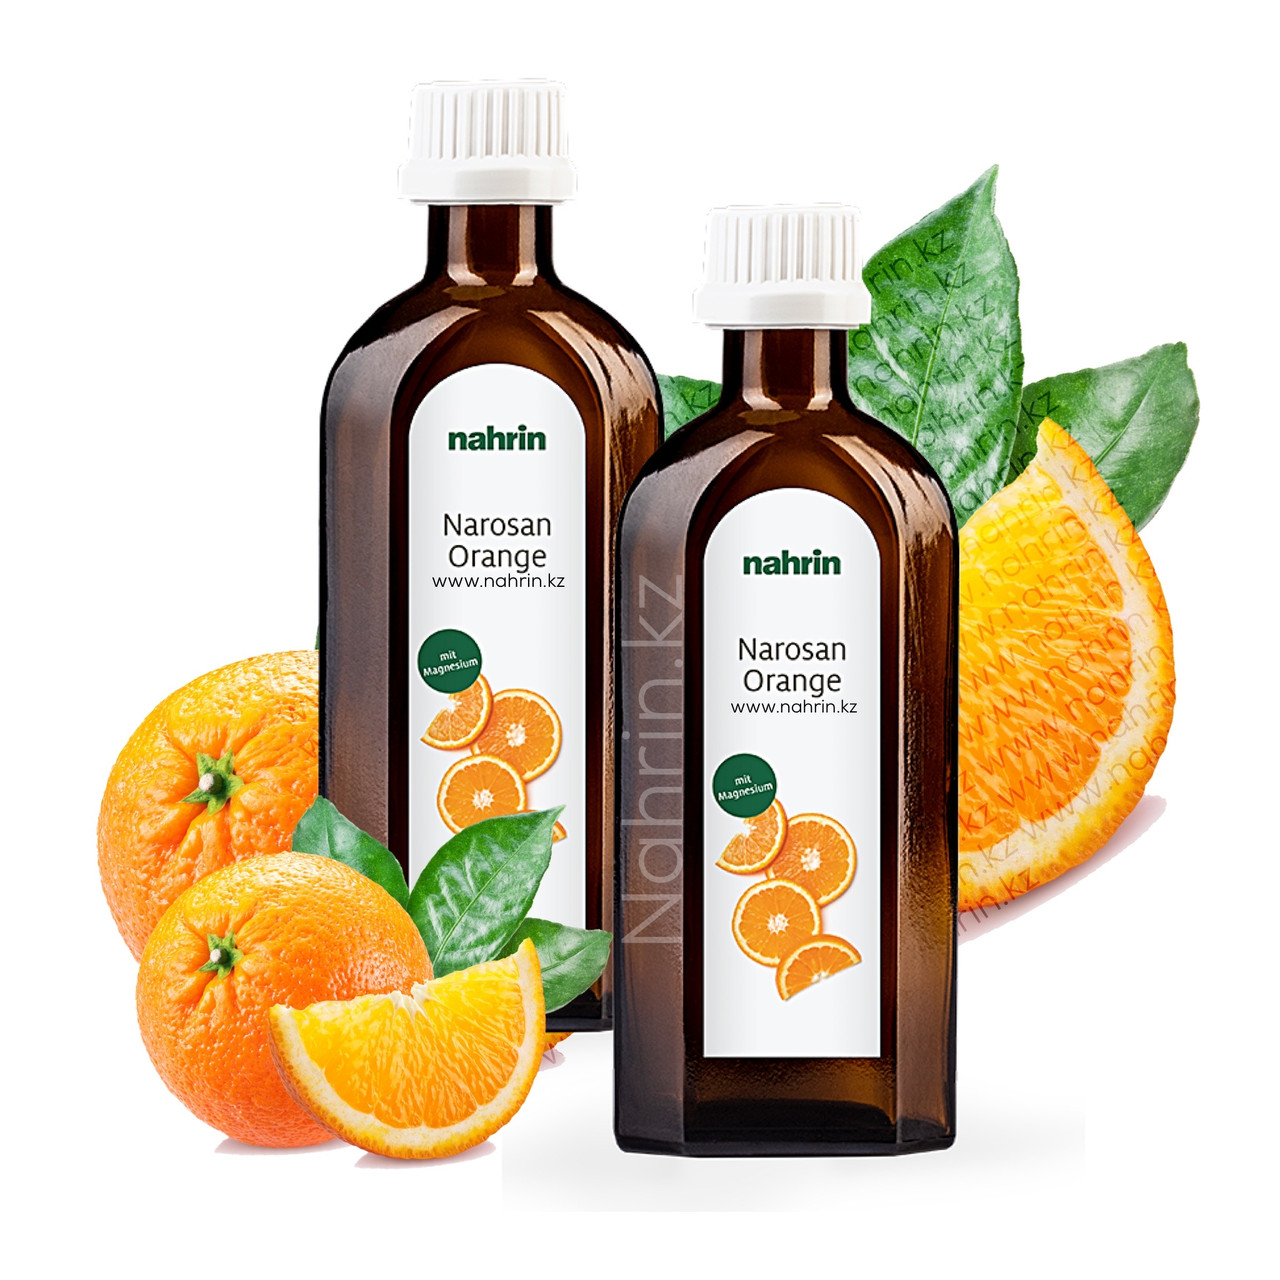 Сироп Все витамины плюс магний Нарин Наросан Апельсин Nahrin Narosan 500ml (-Швейцария)